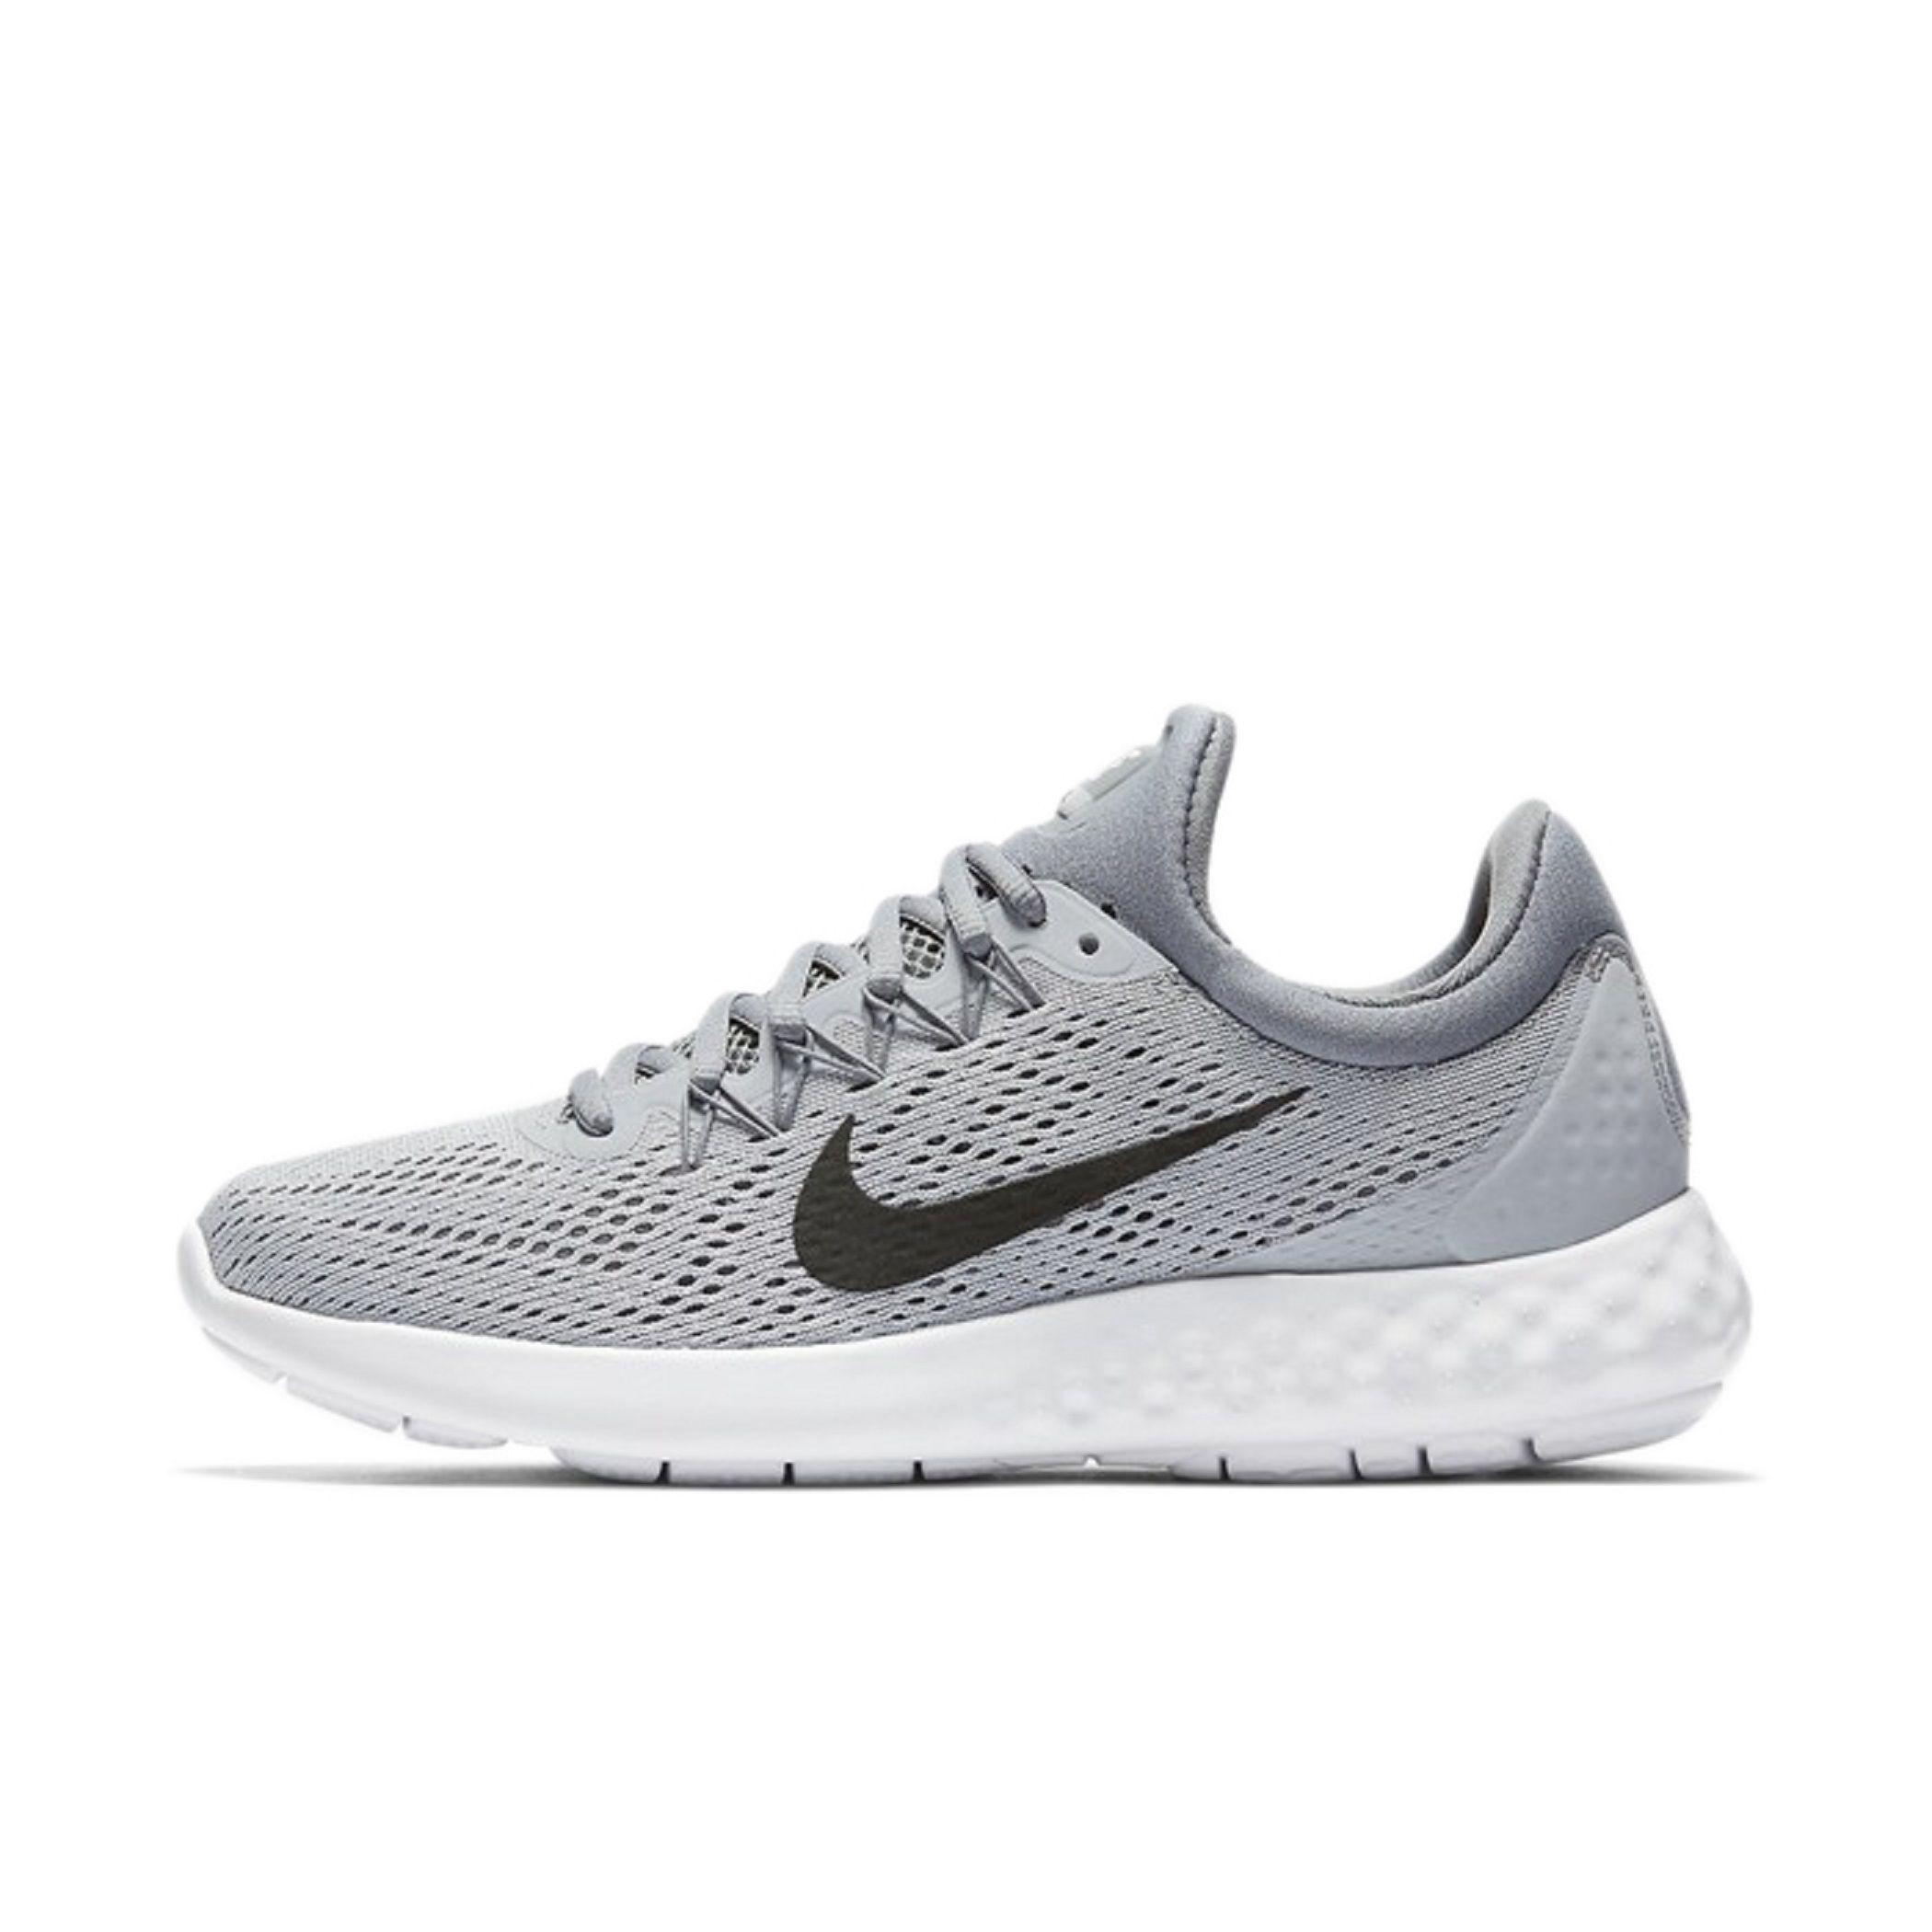 Nike Lunar Skyelux 2018 Blue Running Shoes Buy Nike Lunar Skyelux